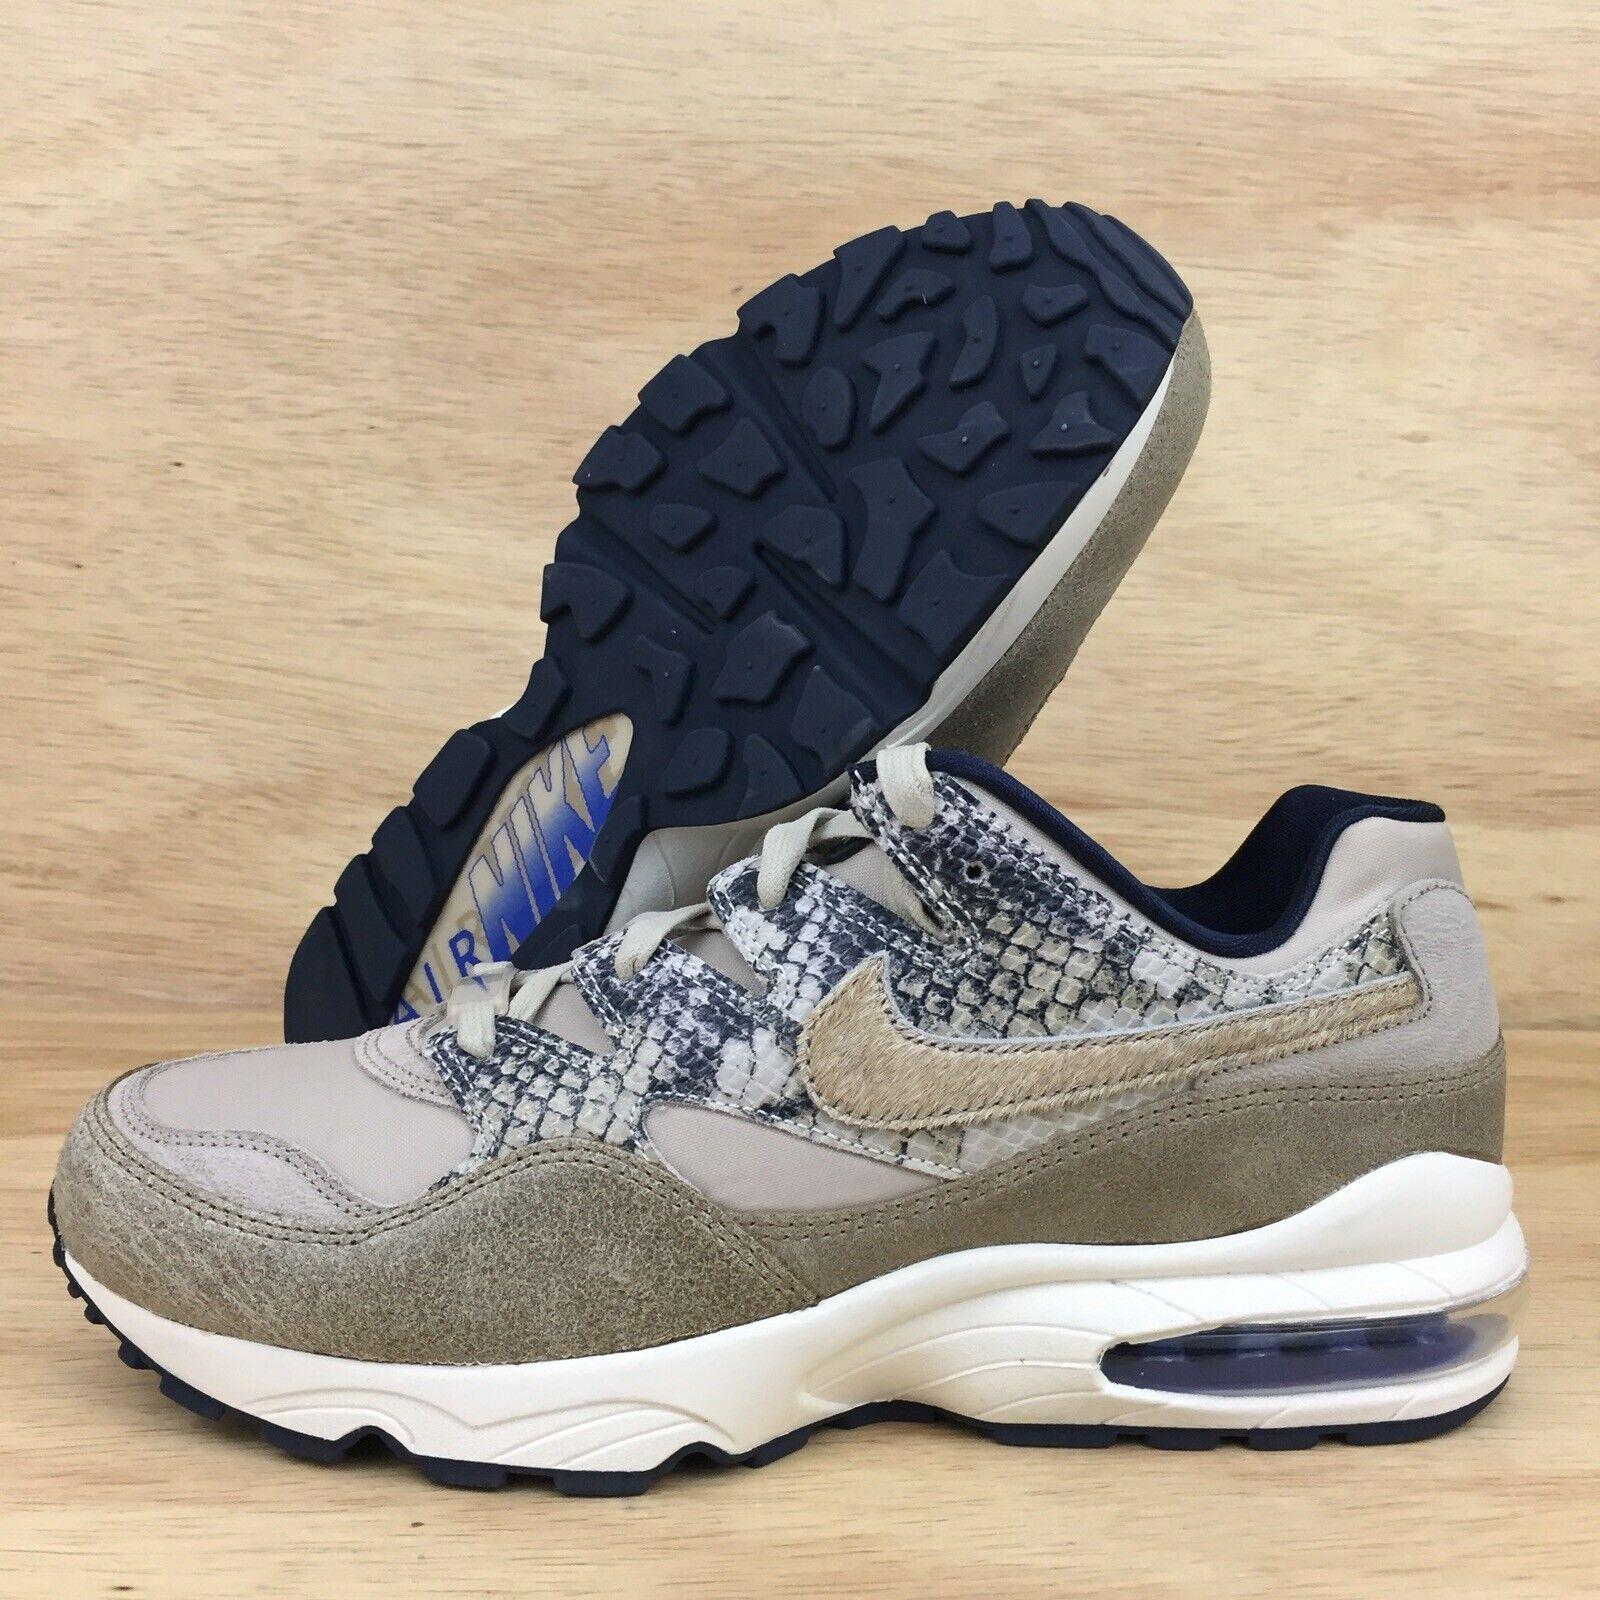 Nike Air Max 94 Snakeskin Mens SZ 10 AT8439-001 Newsprint Running shoes